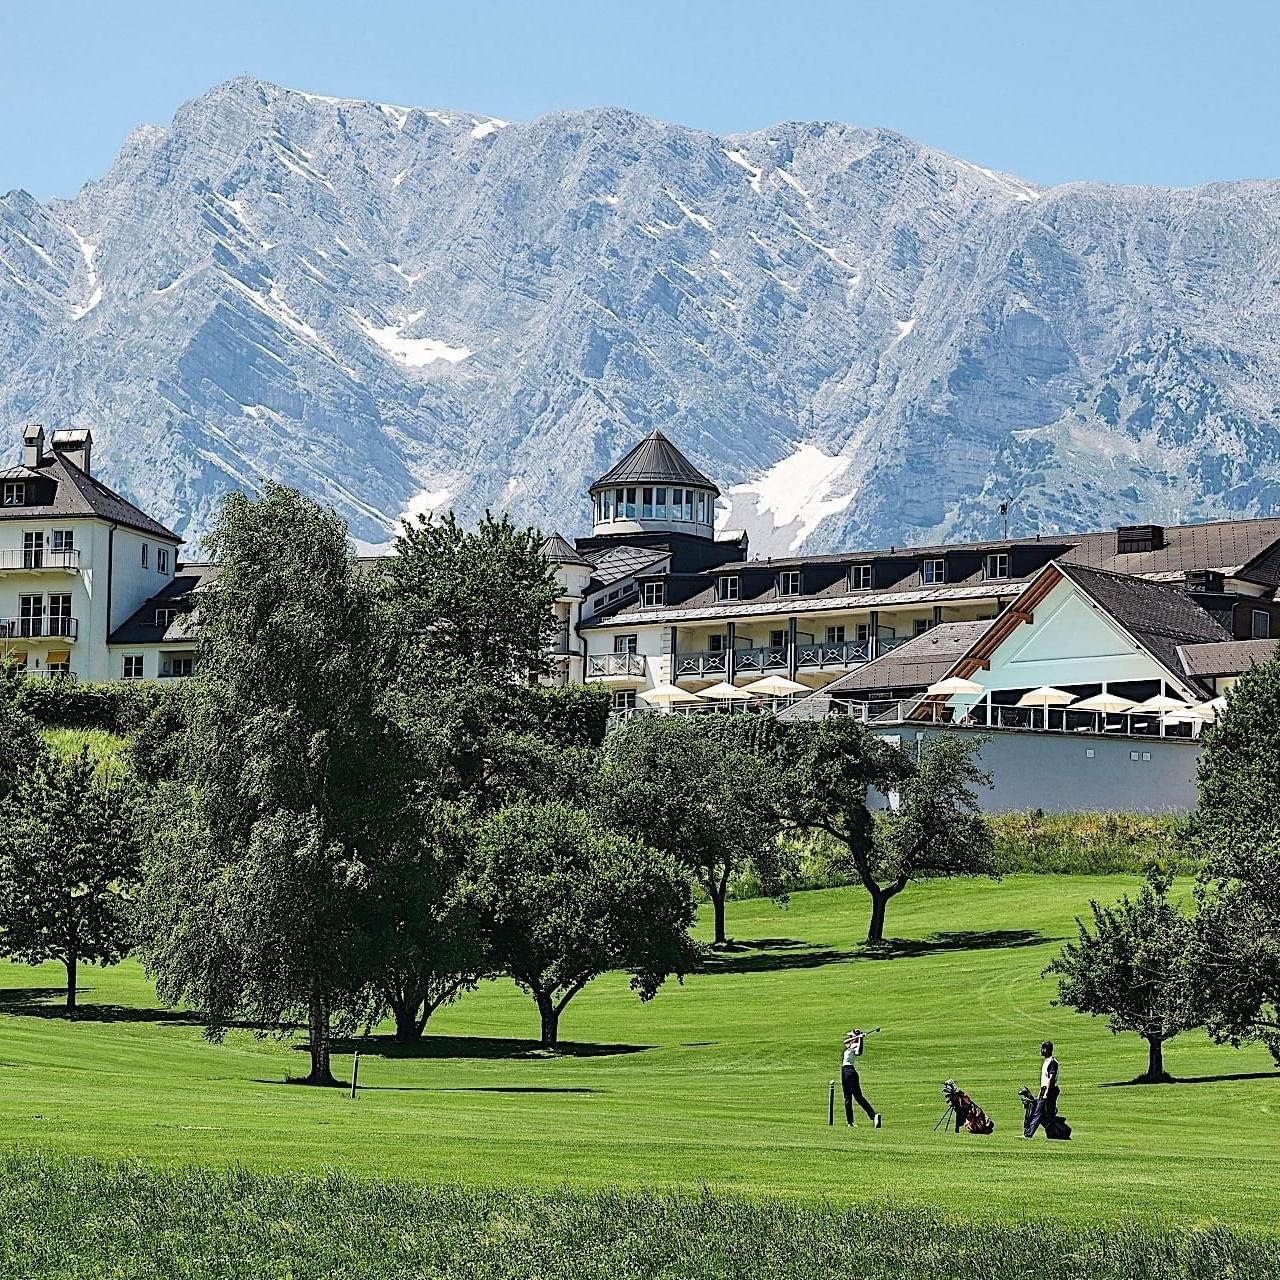 Landscape from Schloss Pichlarn Hotel in Austria